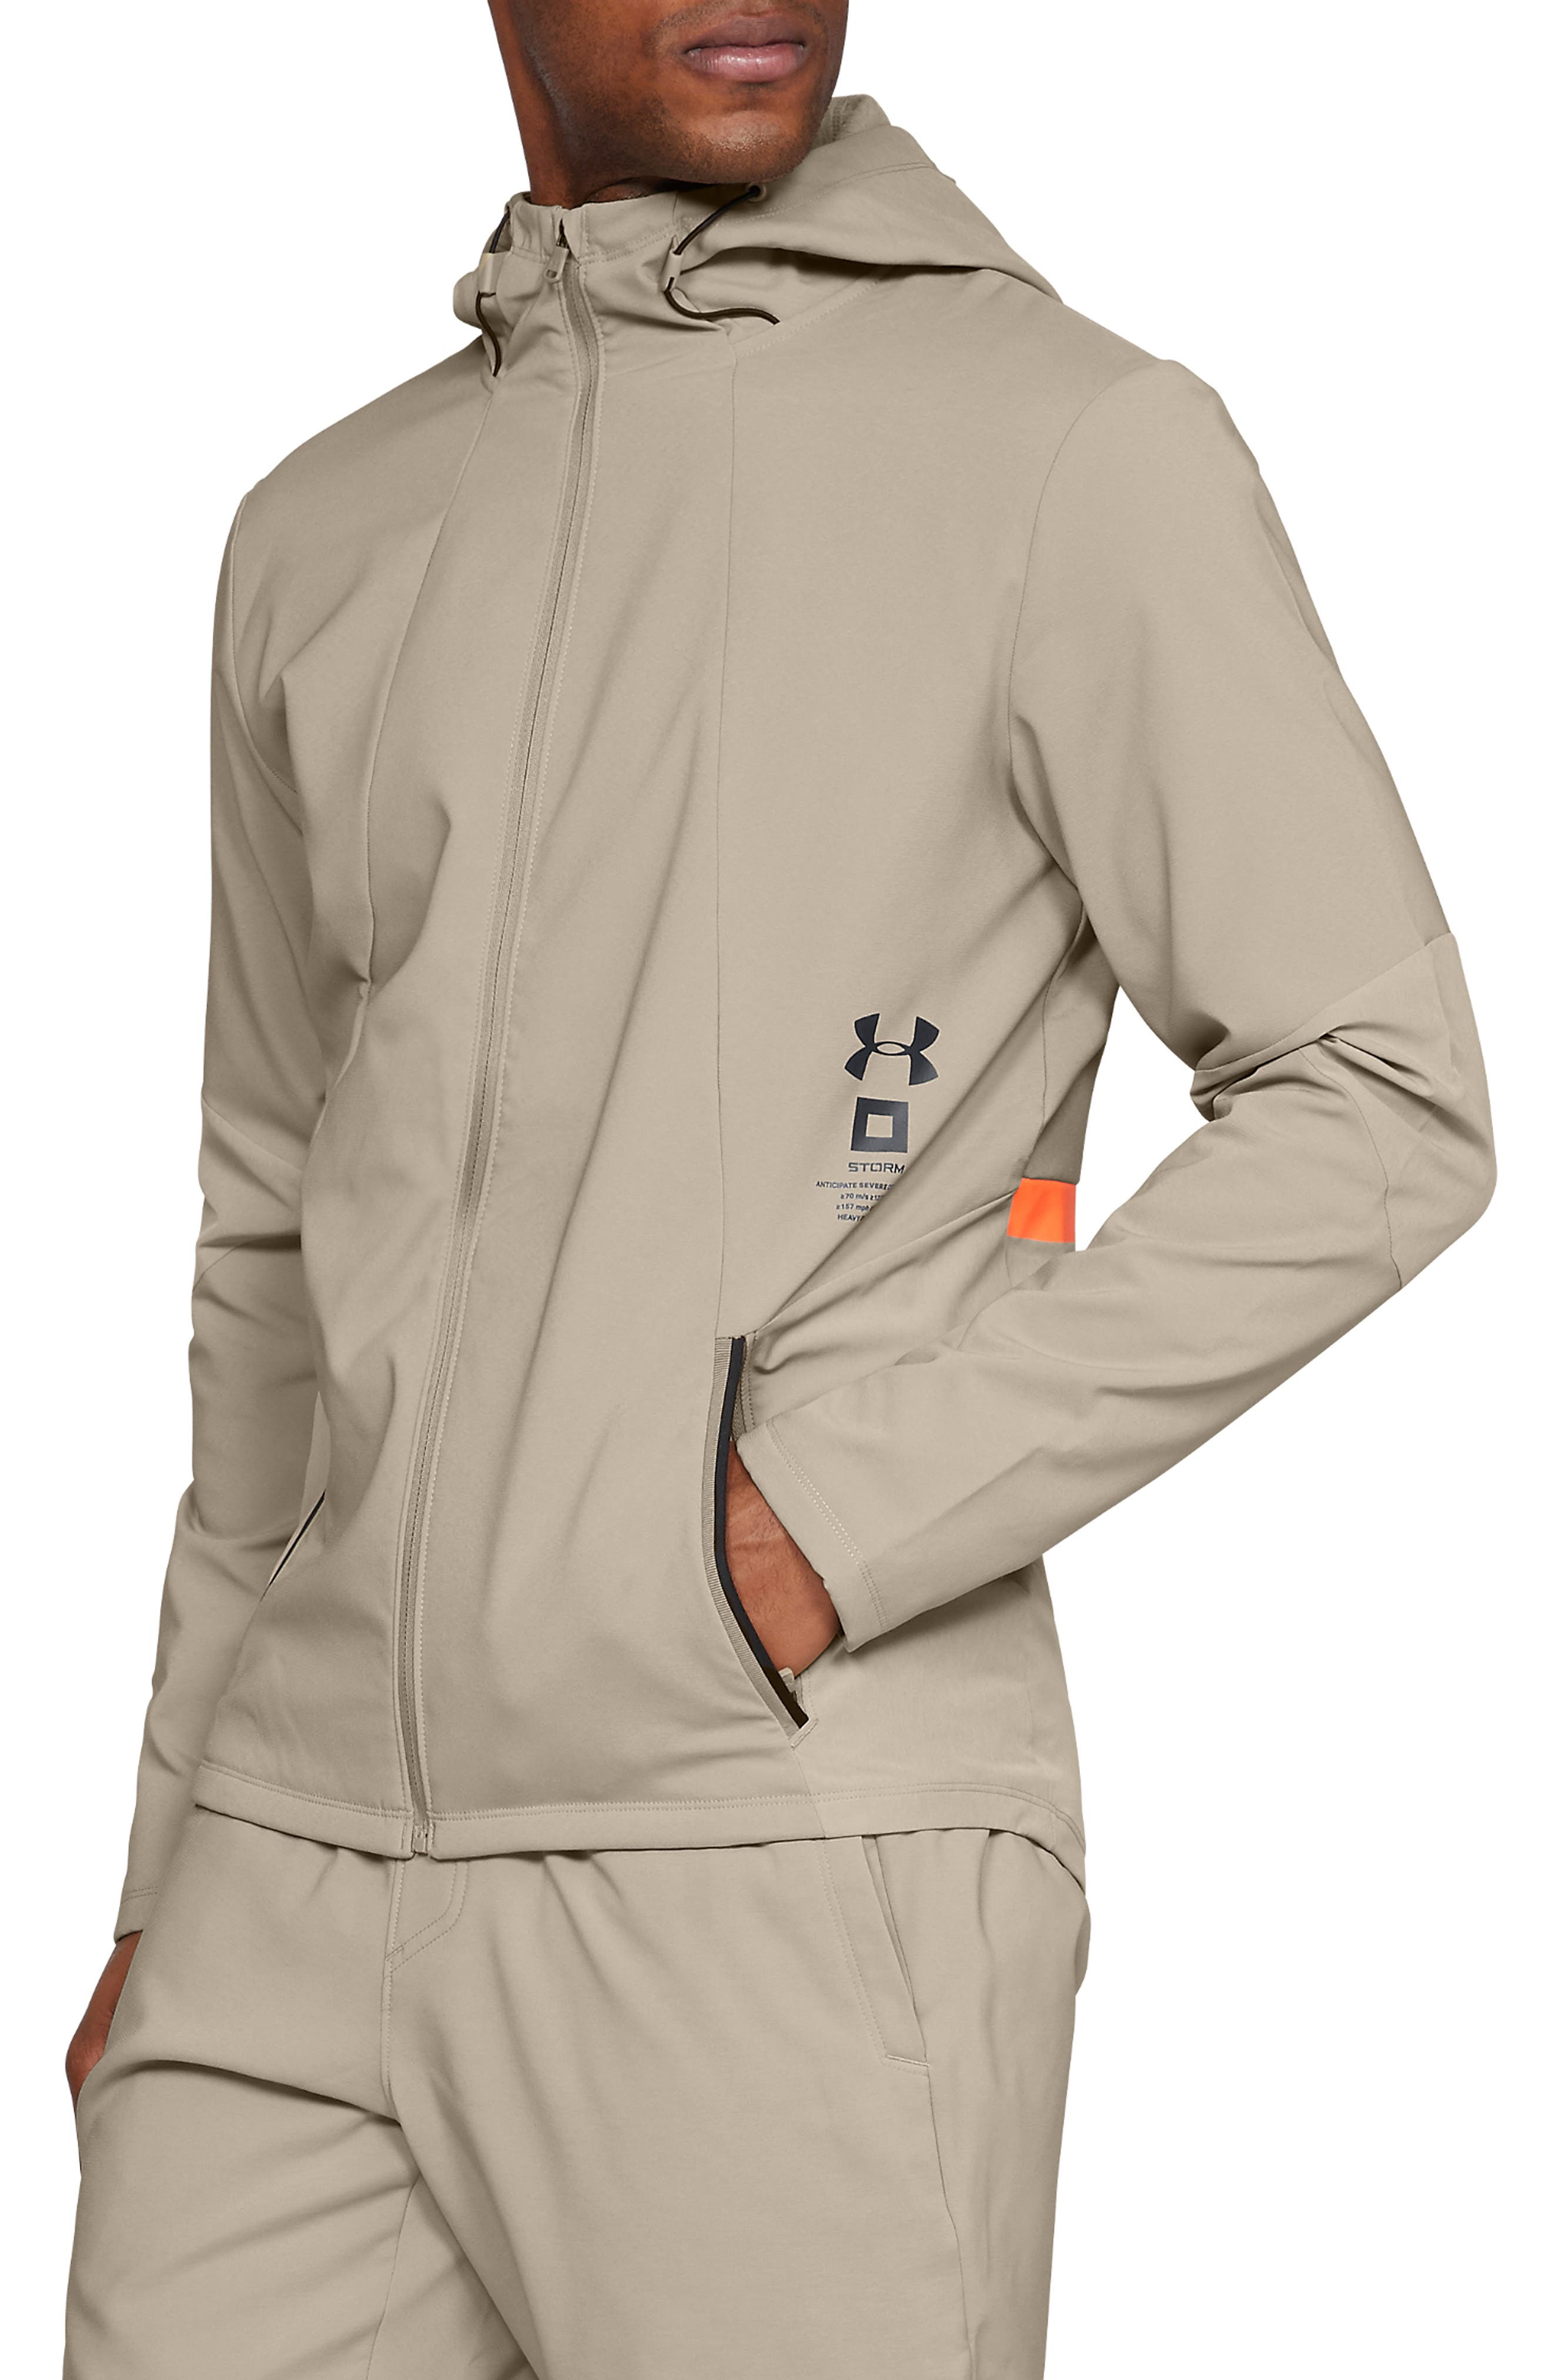 Storm Cyclone Water Repellent Hooded Jacket,                             Main thumbnail 1, color,                             CITY KHAKI/ BLACK